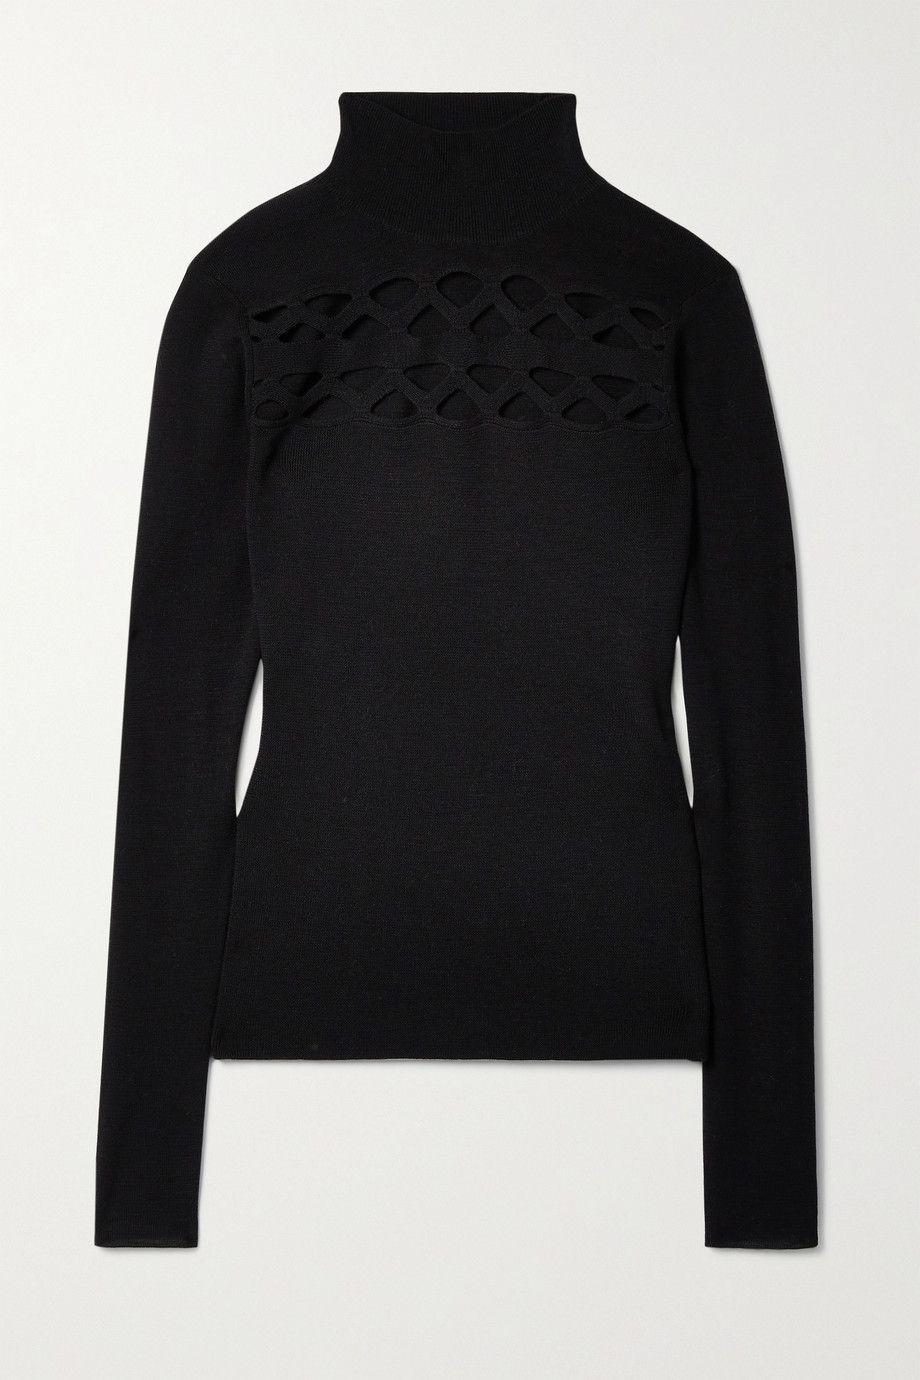 Chloé Cutout wool-blend turtleneck sweater